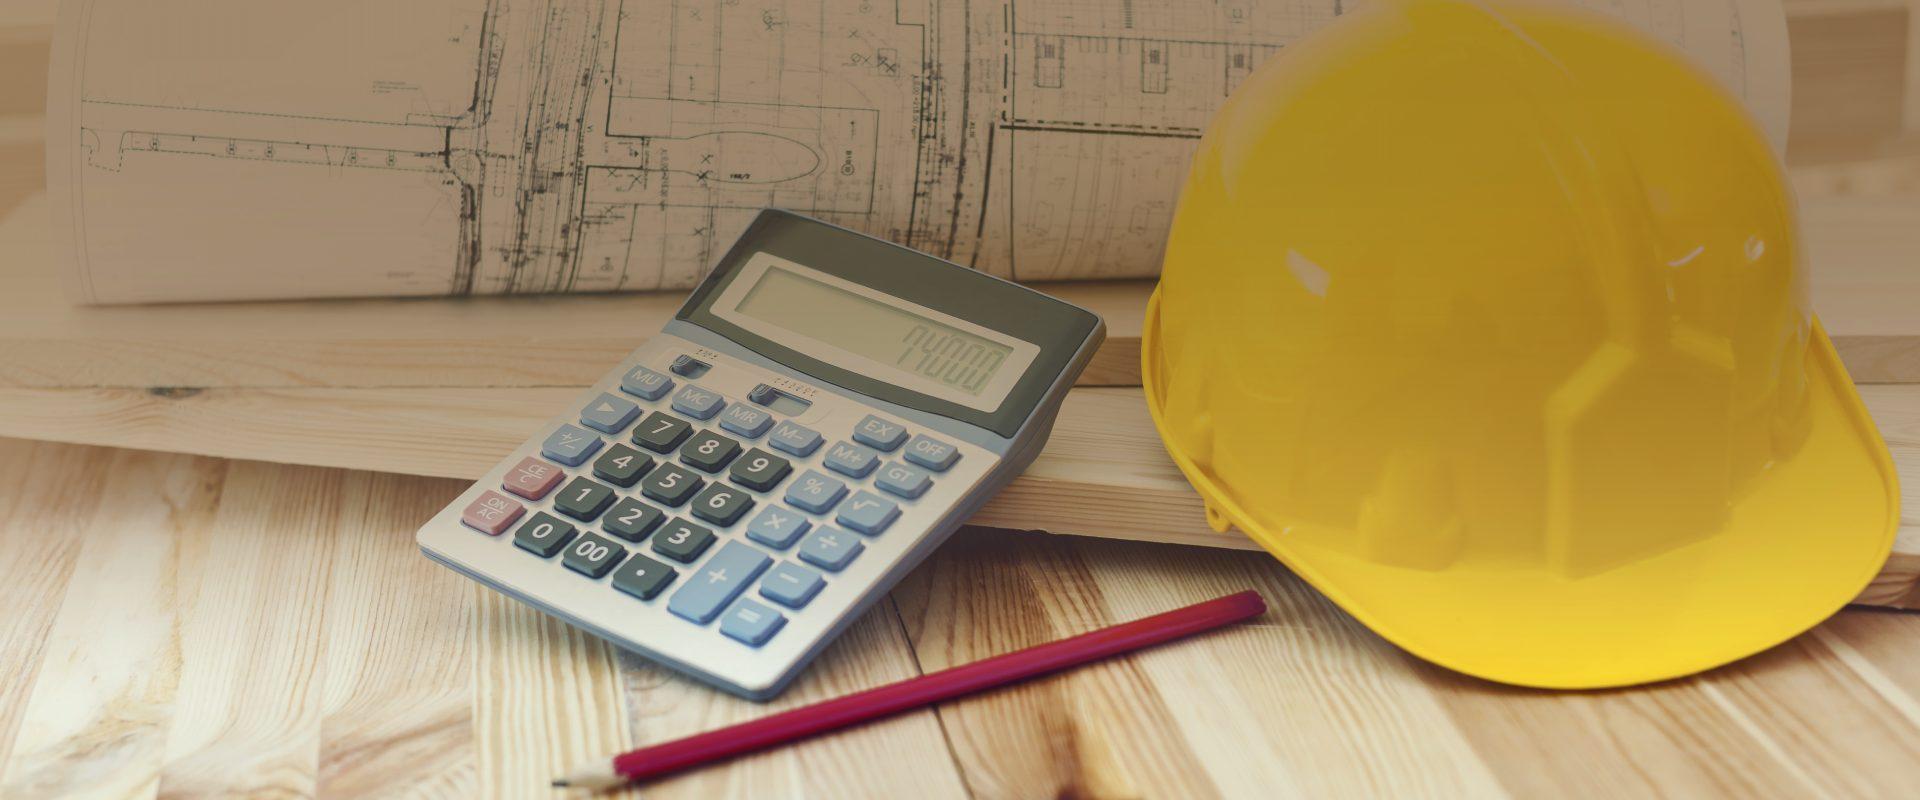 Scopriamo insieme i bonus casa prorogati al 2021